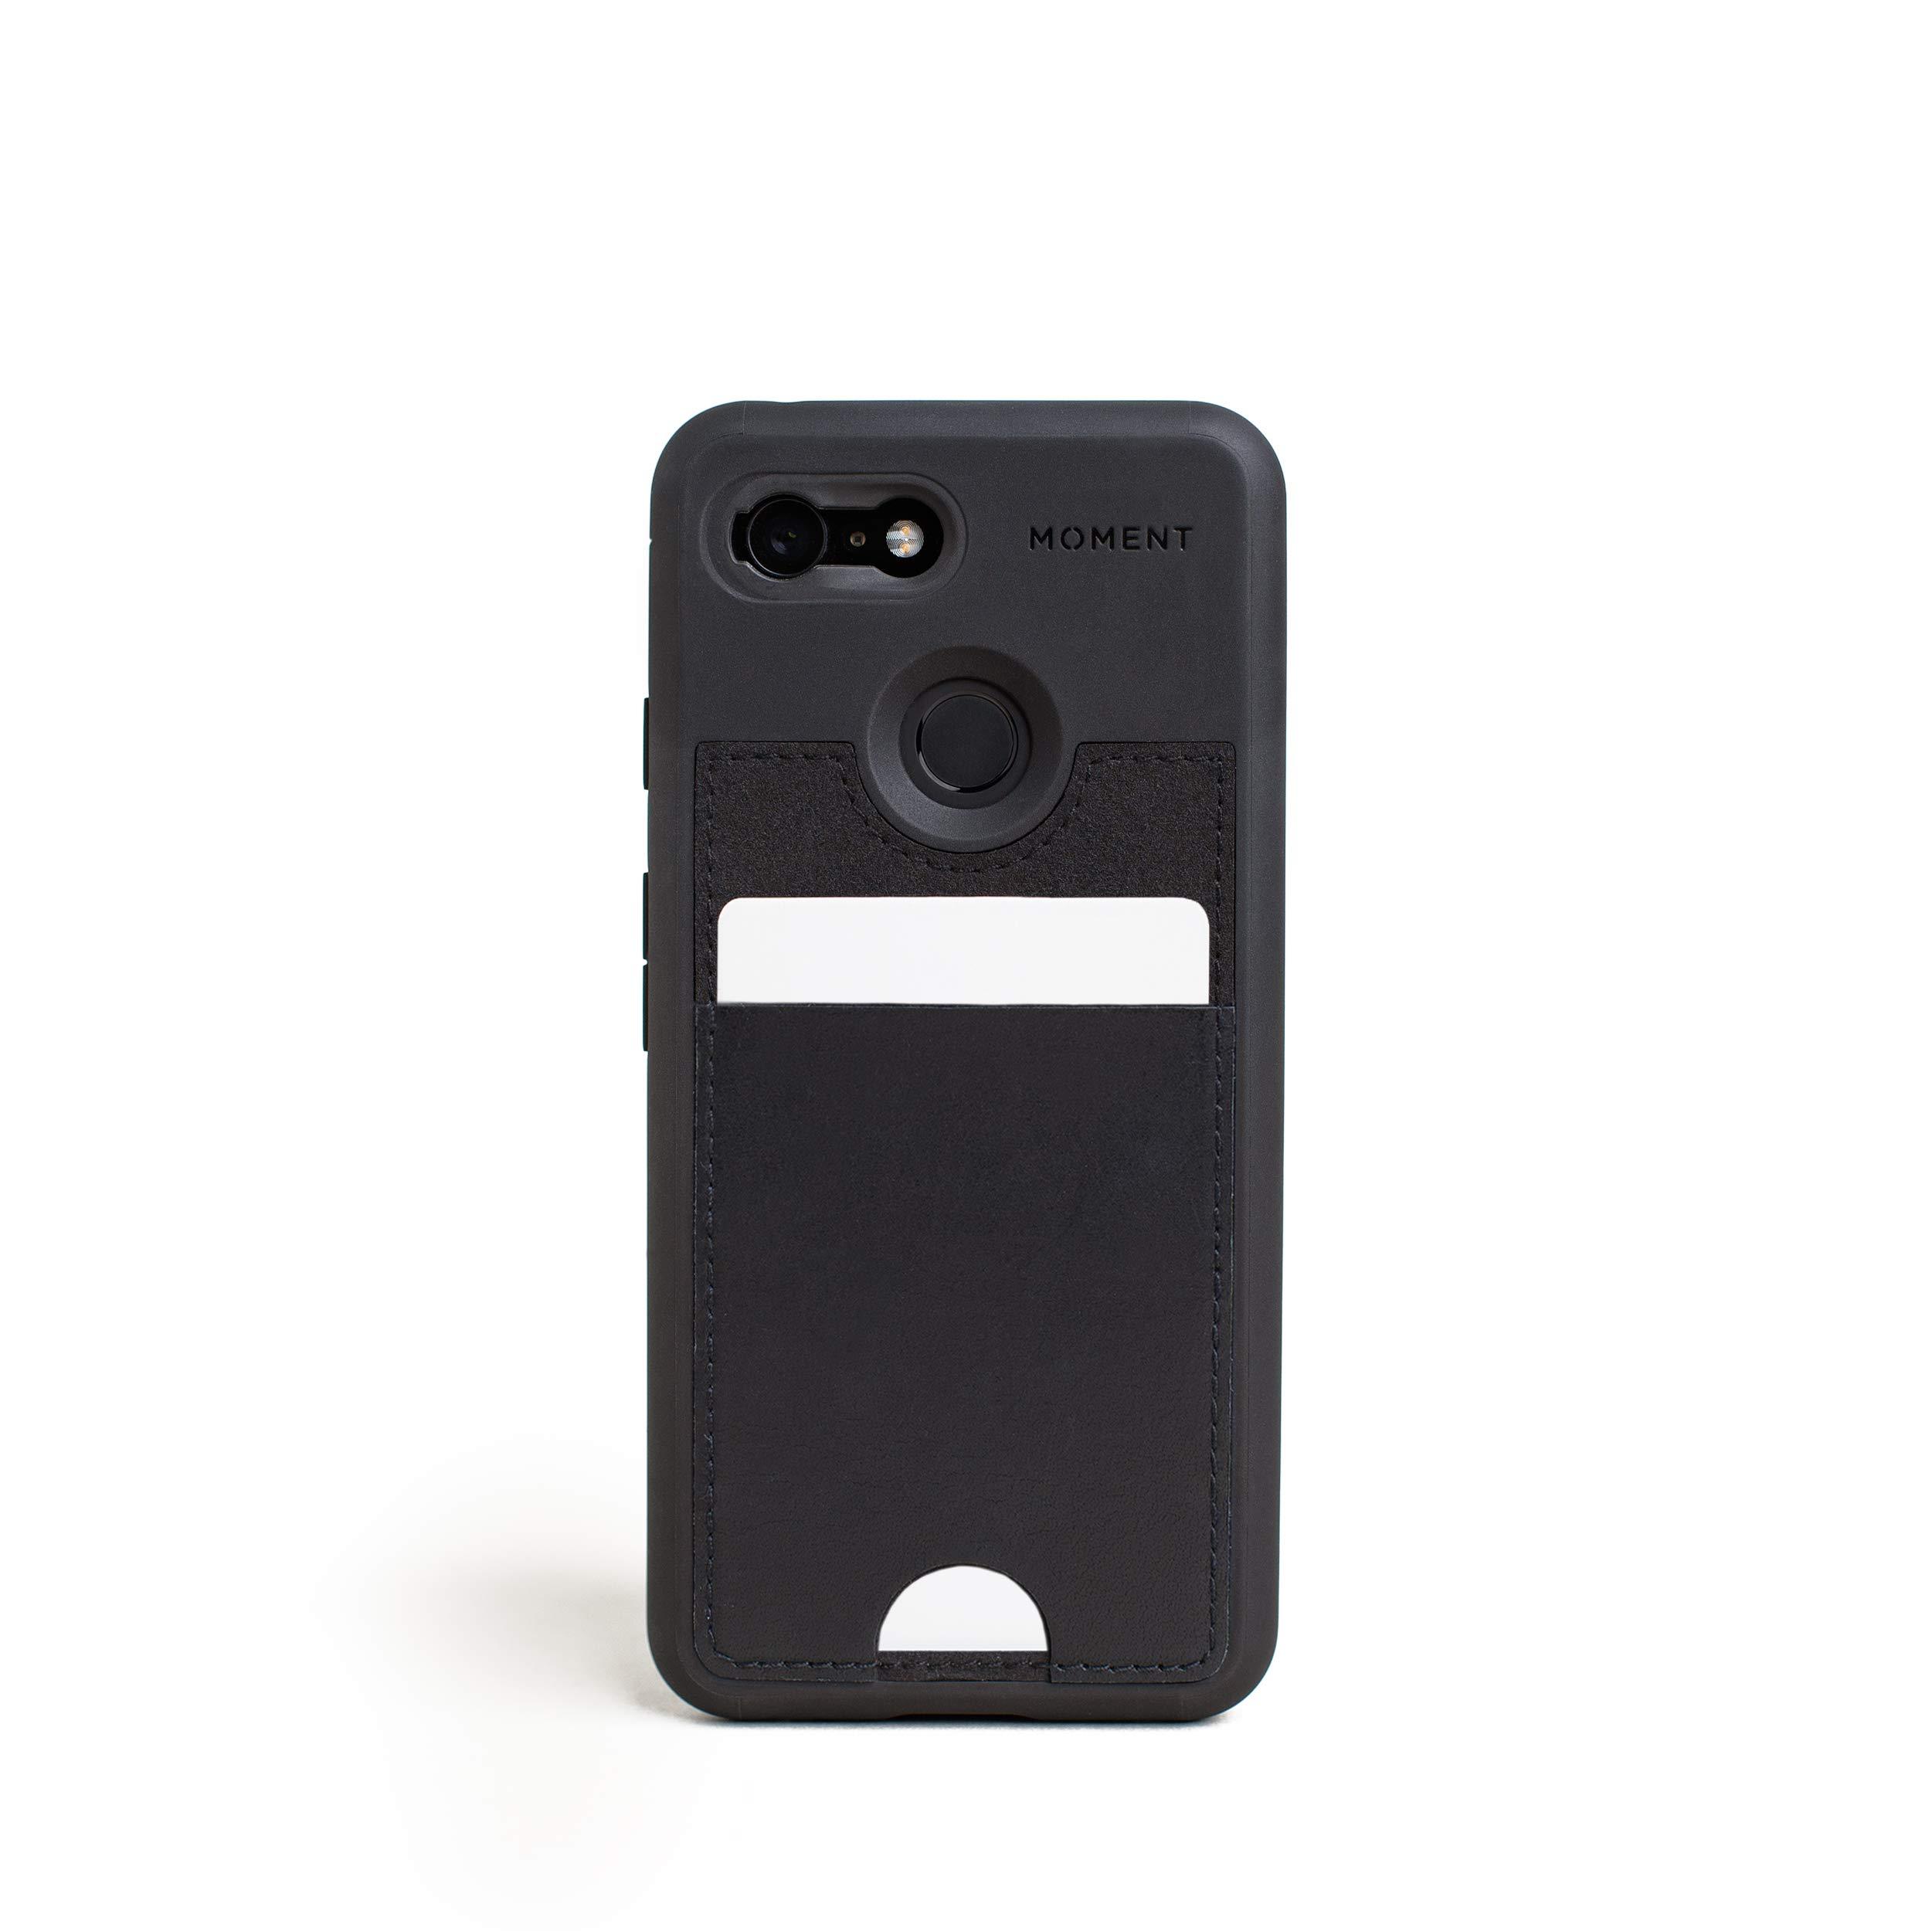 ویکالا · خرید  اصل اورجینال · خرید از آمازون · Pixel 3 Wallet Case || Moment Photo Case in Black Leather - Thin, Protective, Wrist Strap Friendly Wallet case for Camera Lovers. wekala · ویکالا